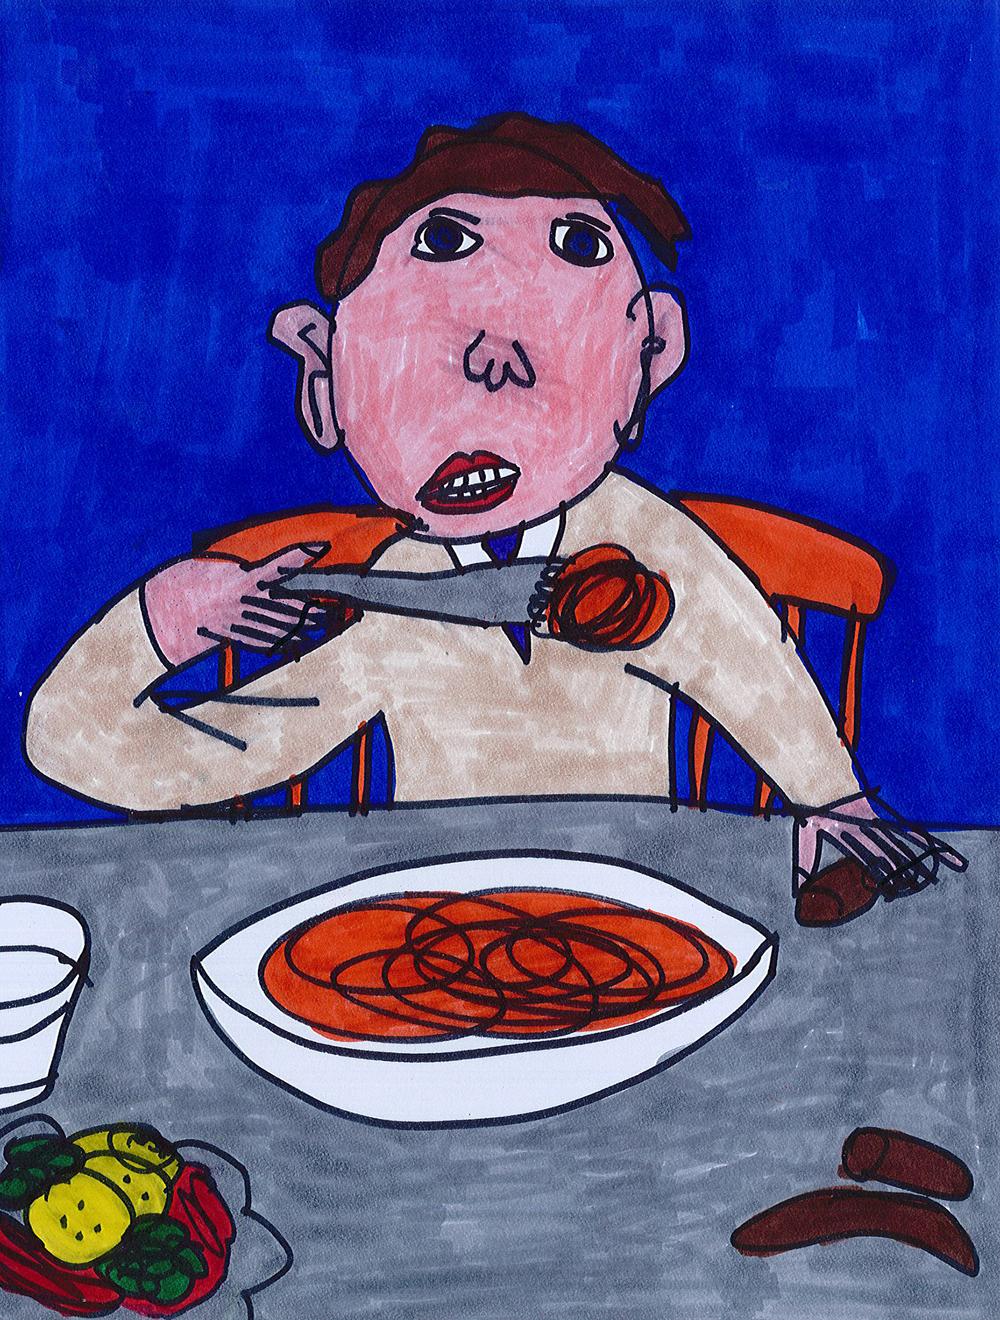 Gail-dinner-2.png